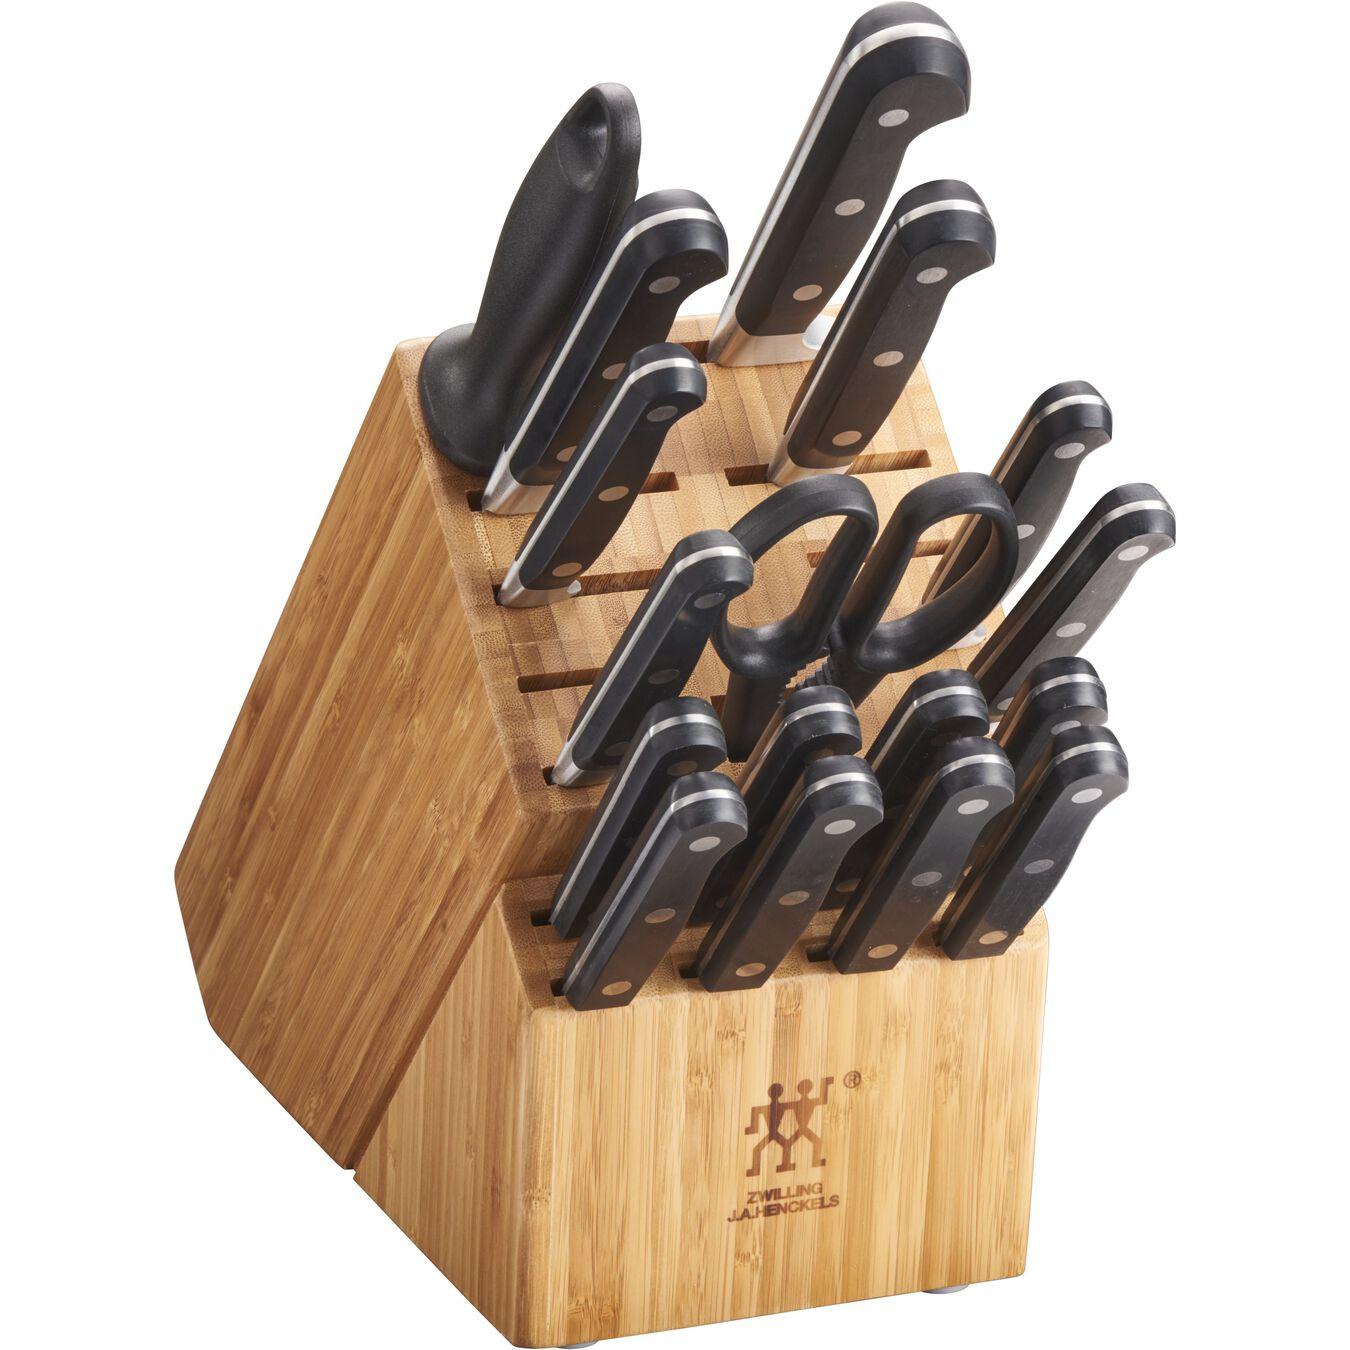 18-pc Knife Block Set,,large 1